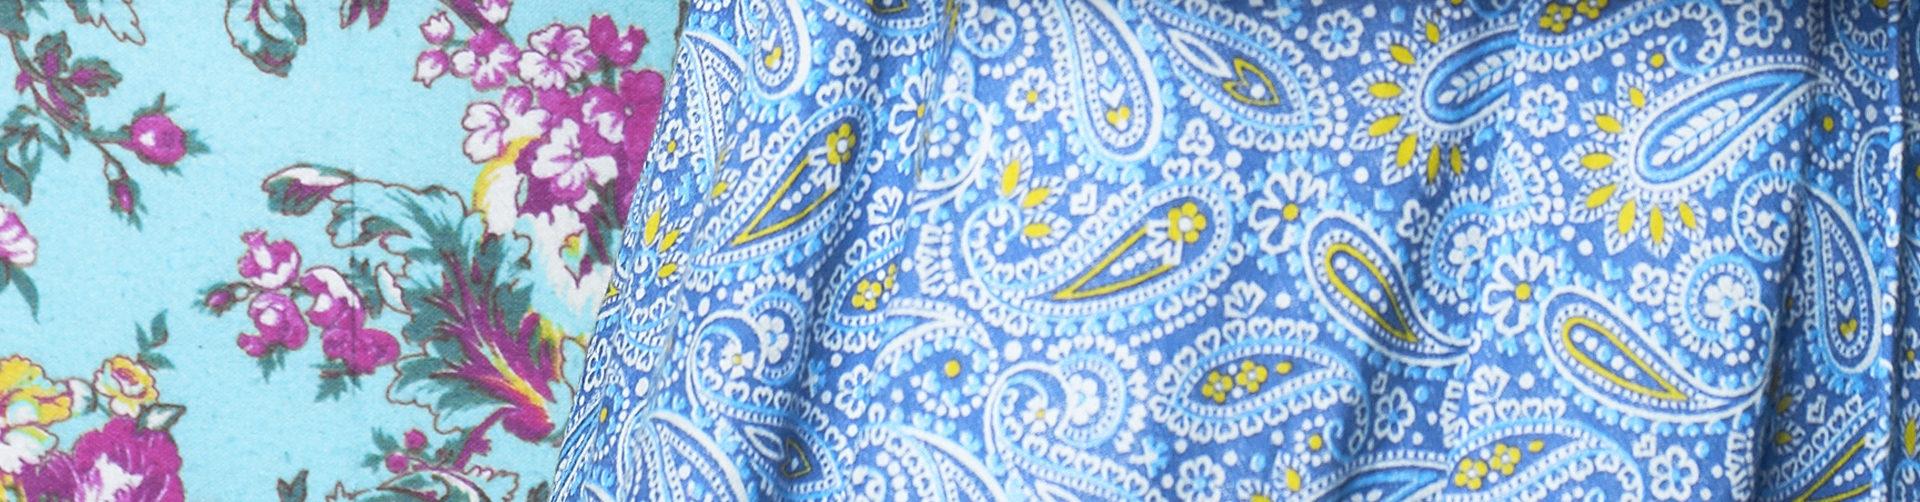 Printed FabricPrinted Fabric